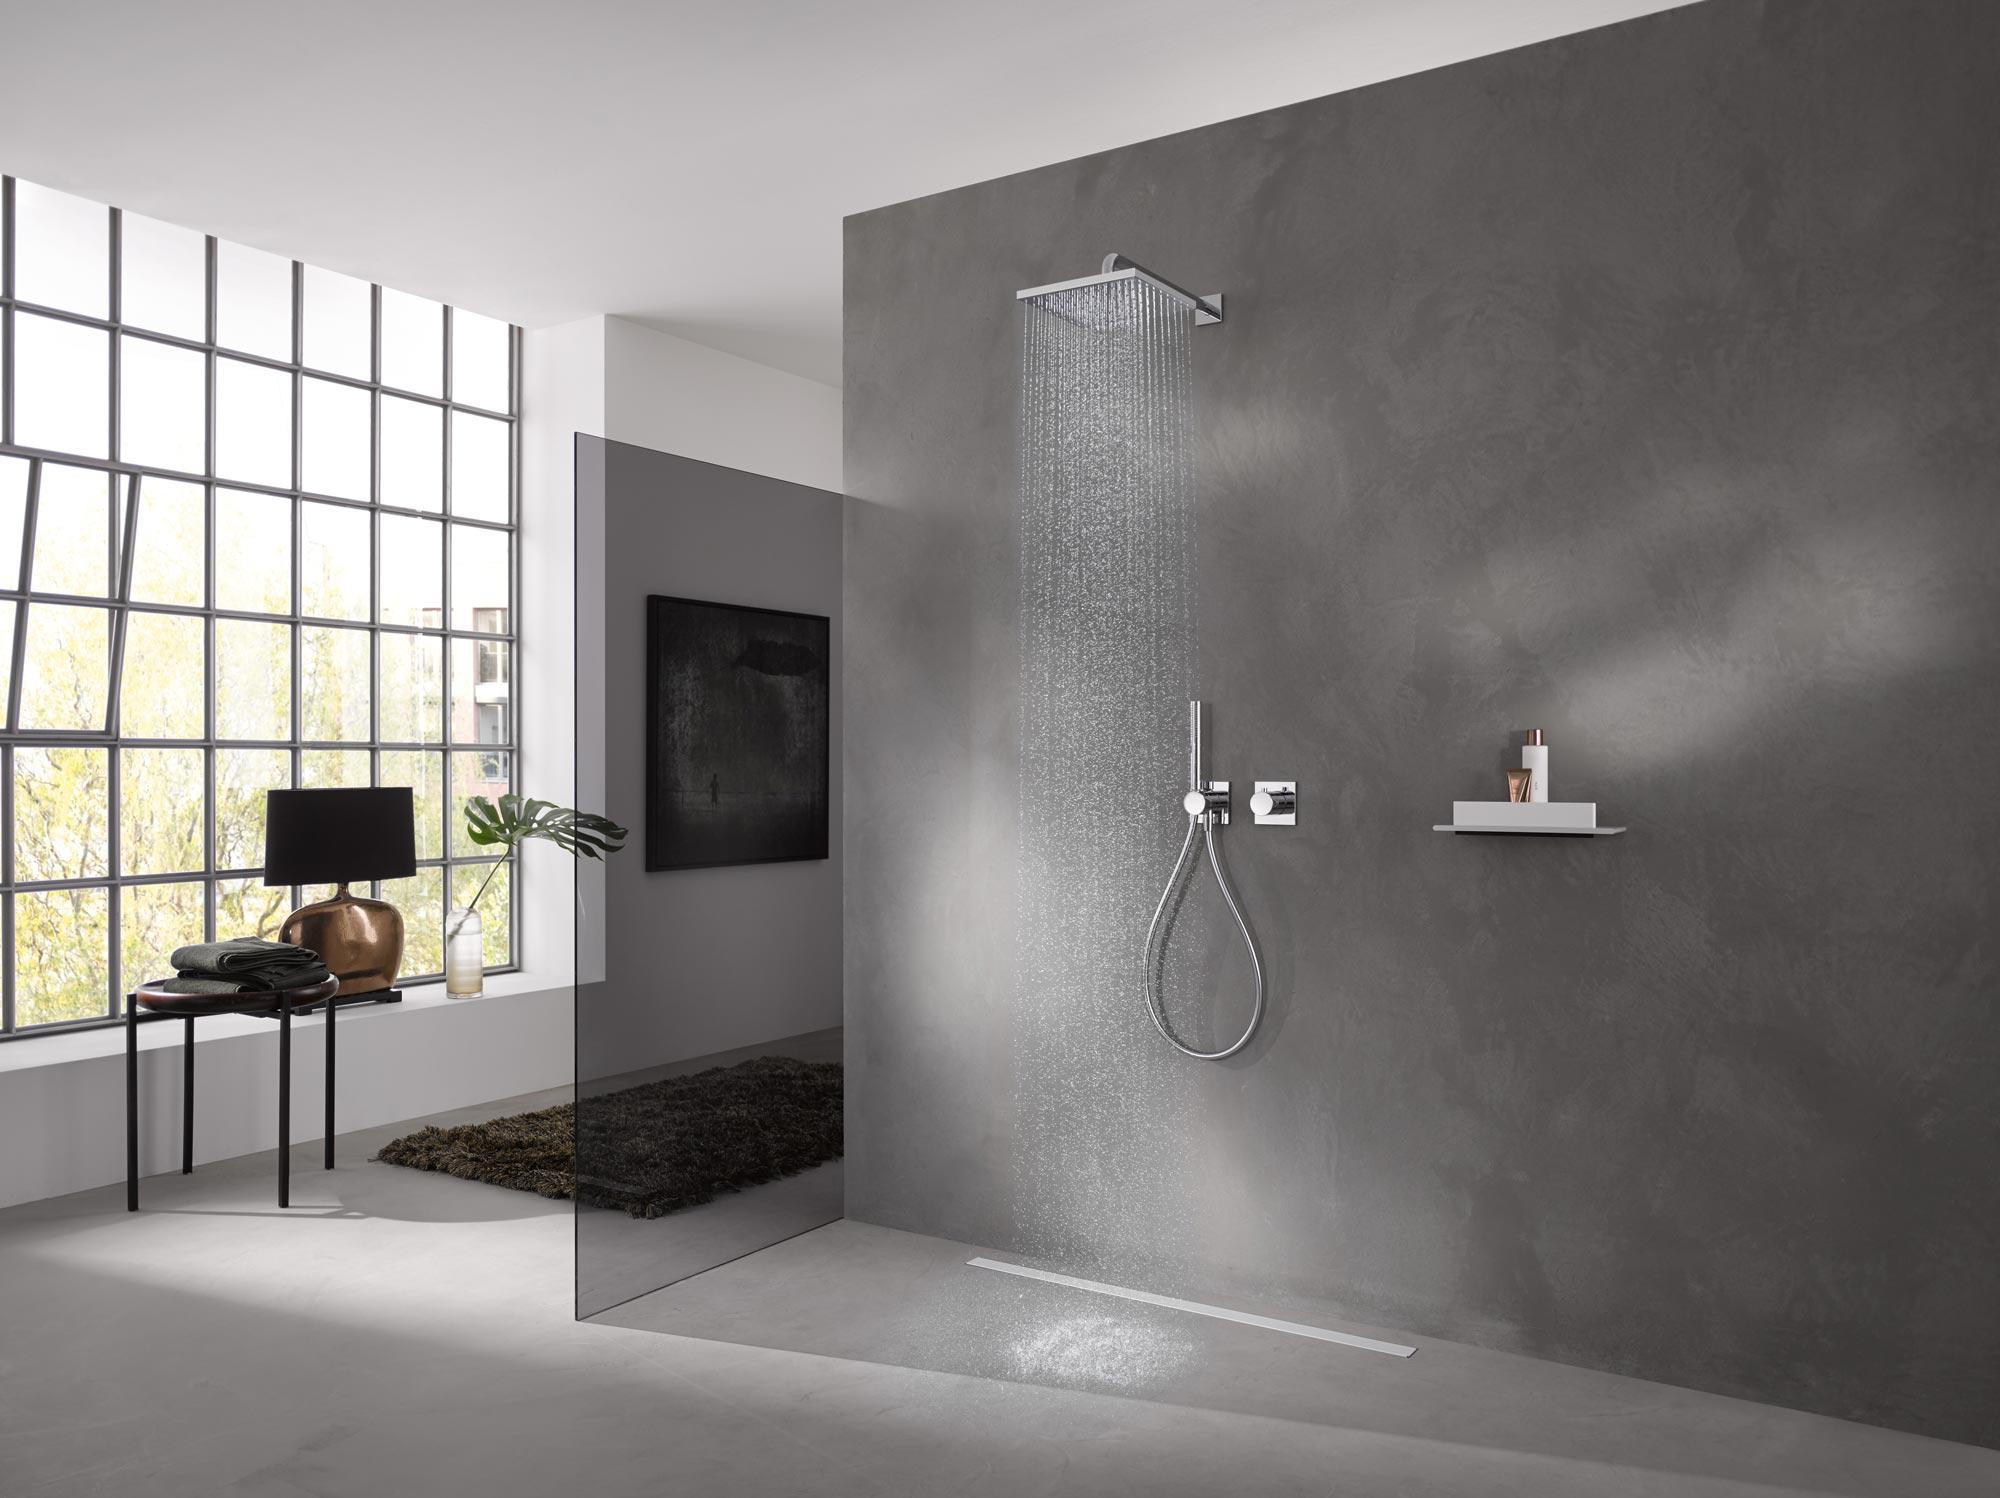 barrierefreies bad fliesen lang. Black Bedroom Furniture Sets. Home Design Ideas